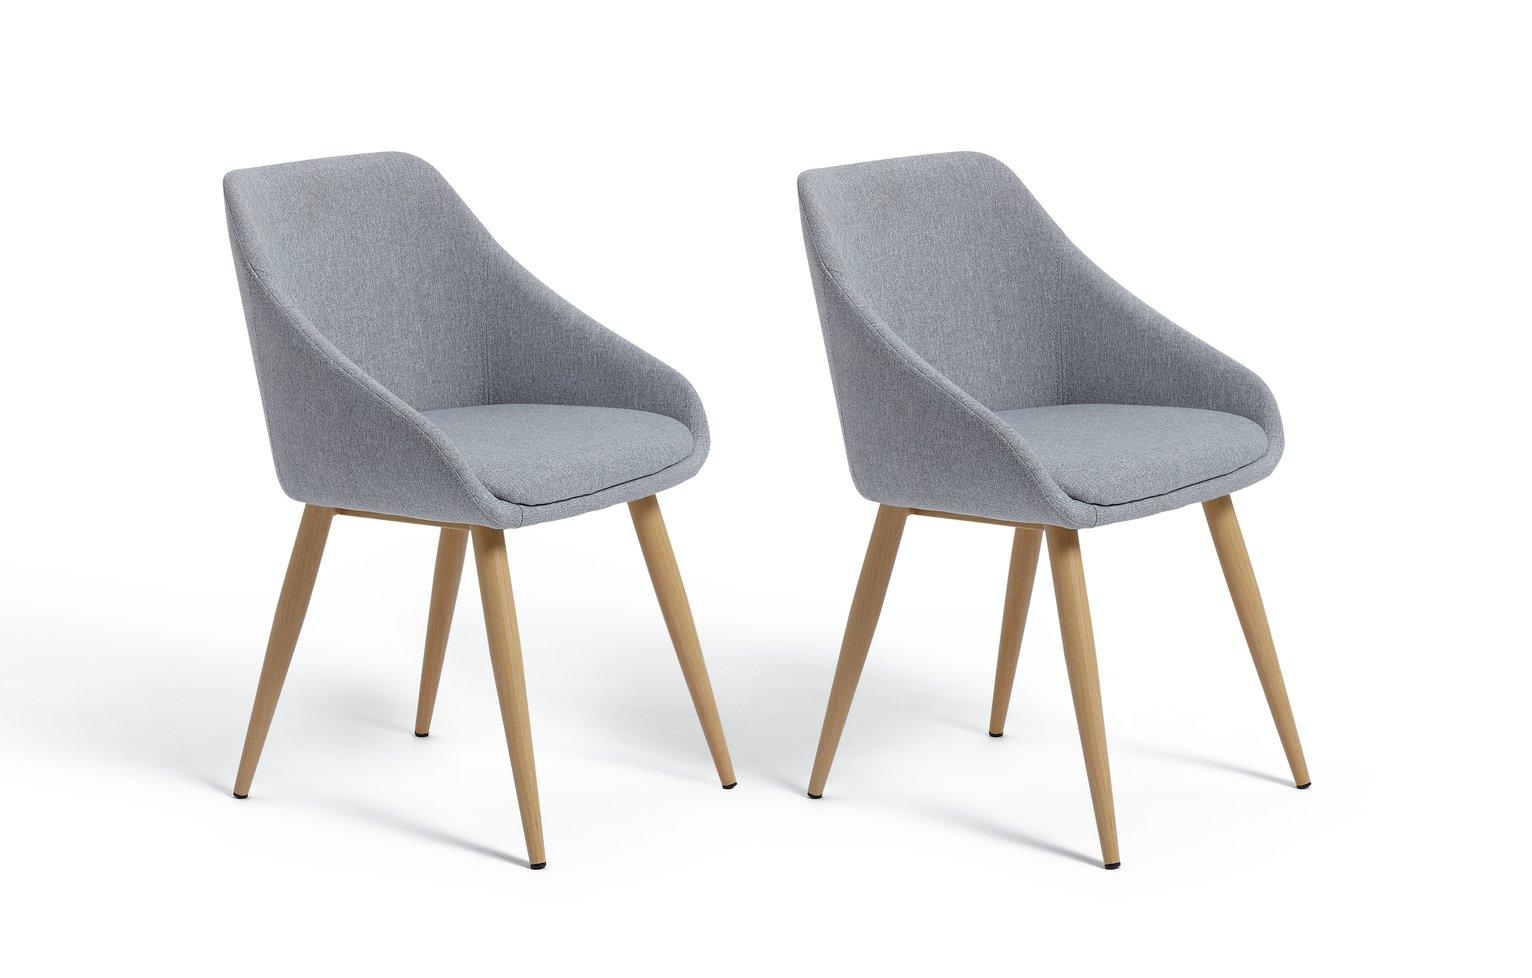 Argos Home Skandi Pair of Fabric Dining Chairs - Grey